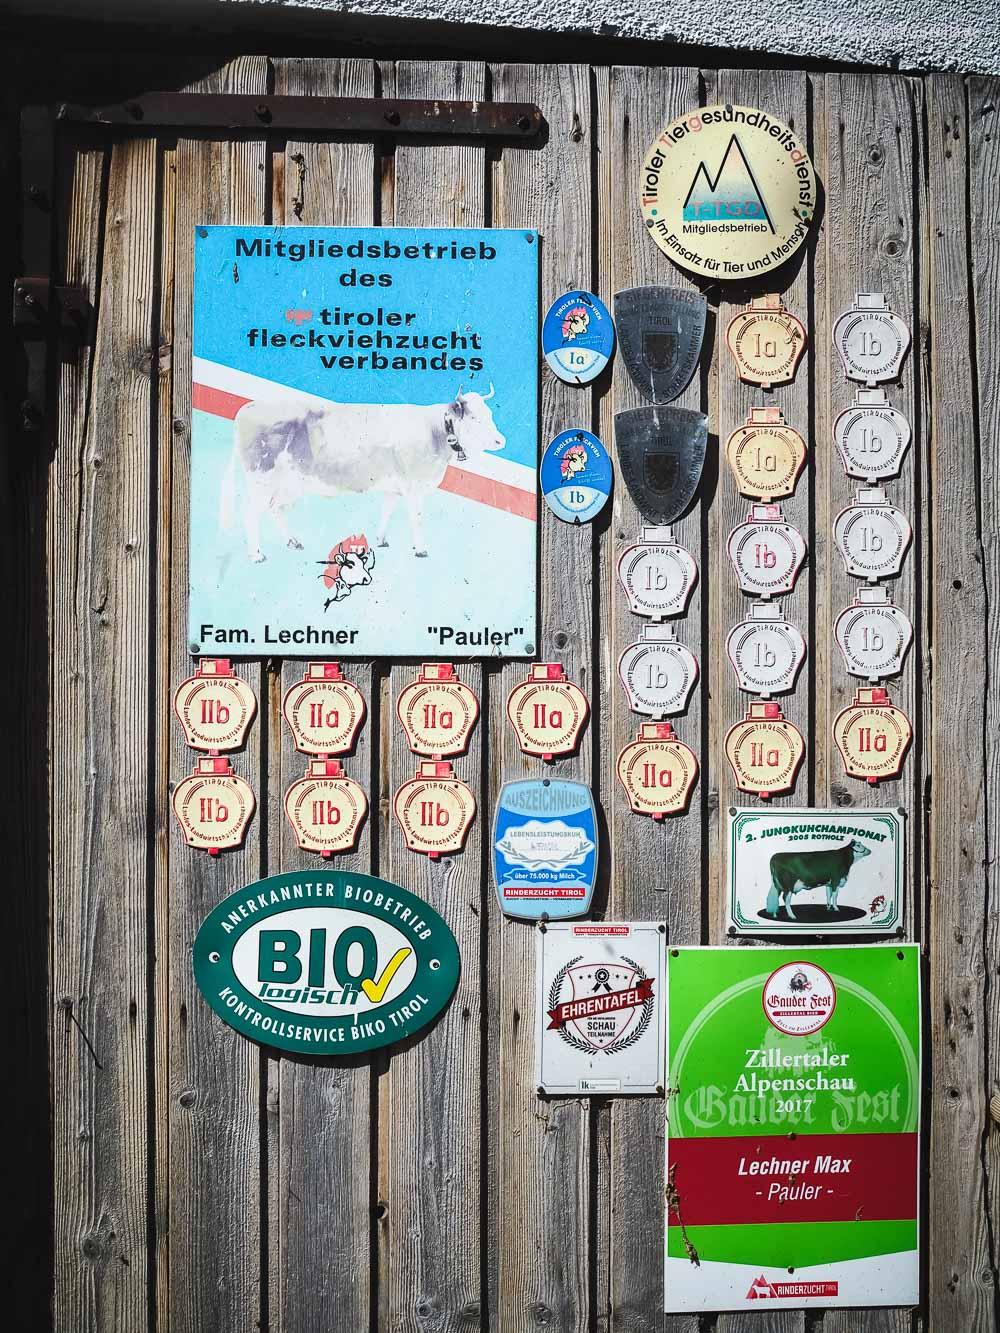 Paulerhof Stumm Best of Zillertal |GourmetGuerilla.de